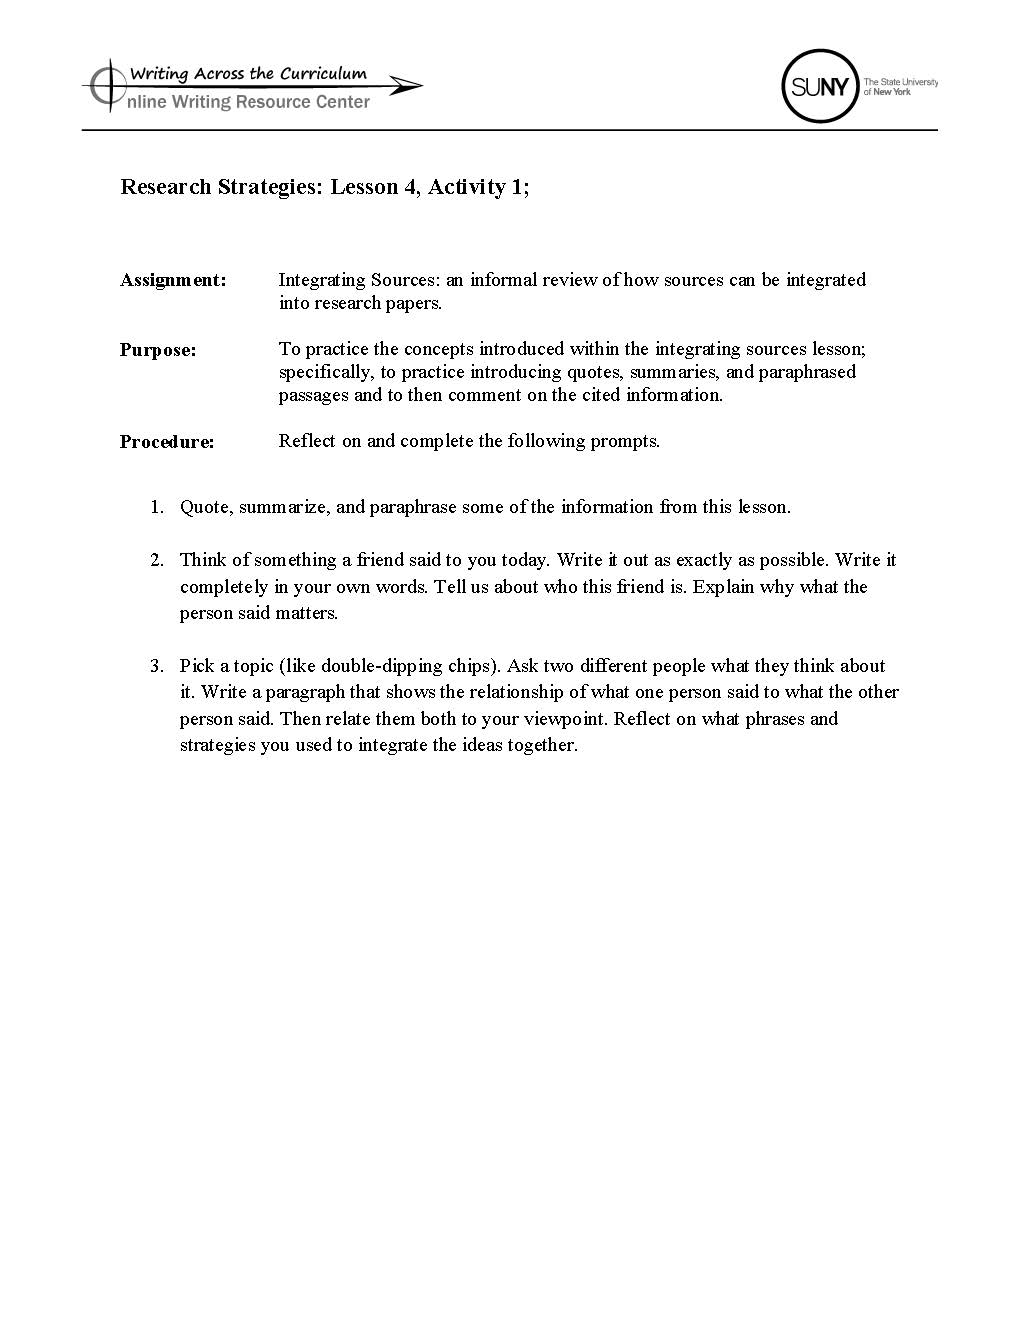 lesson4_activity1